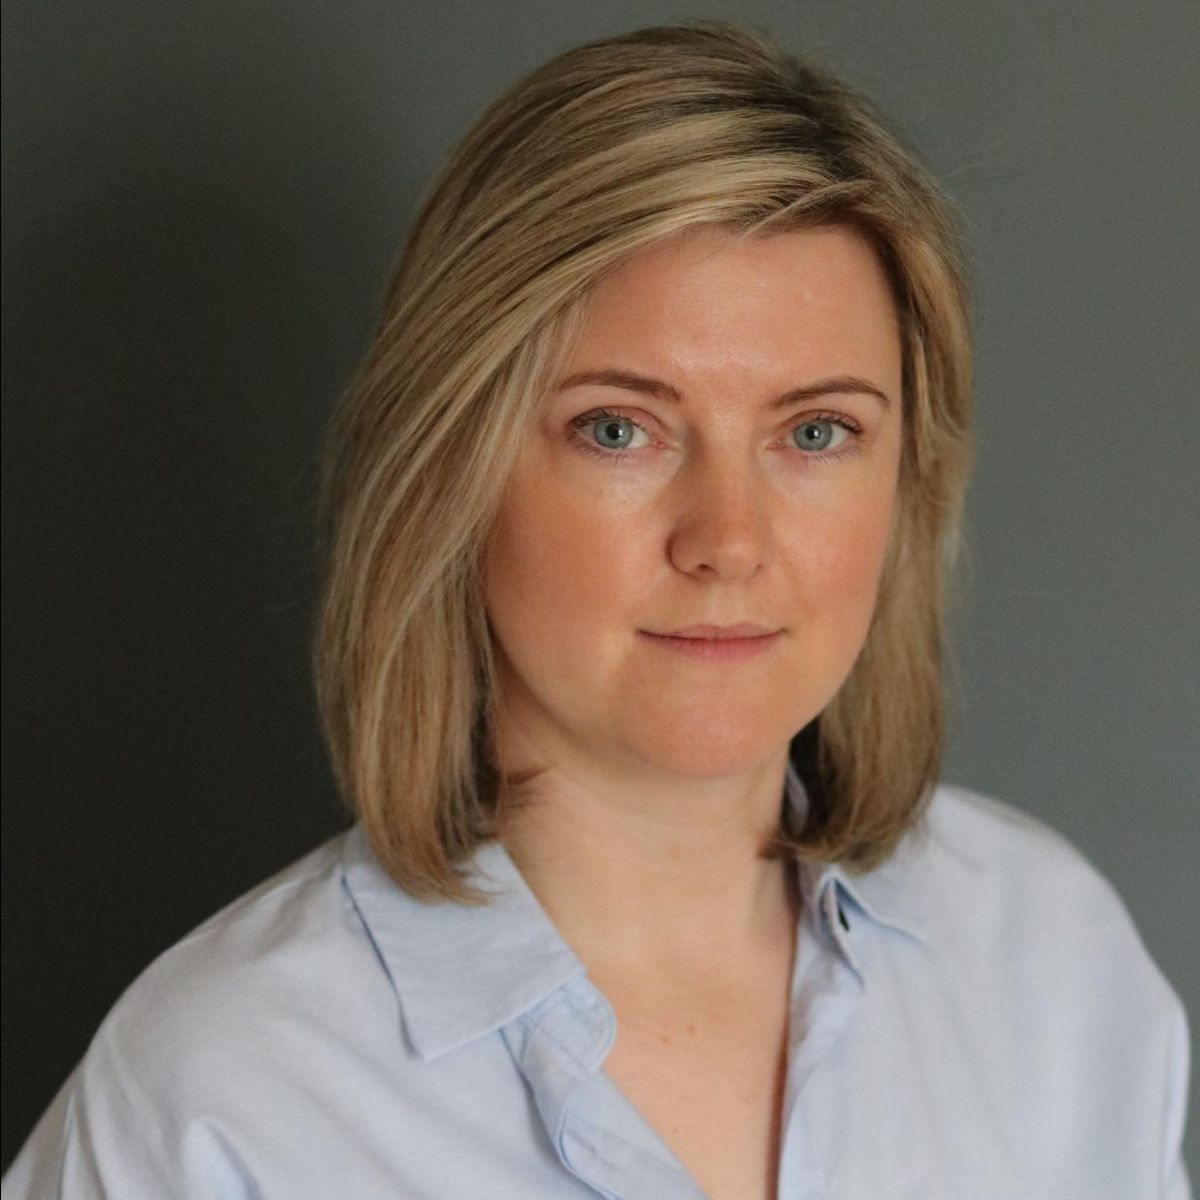 Lorna Finlayson, Scotland director for CoMoUK